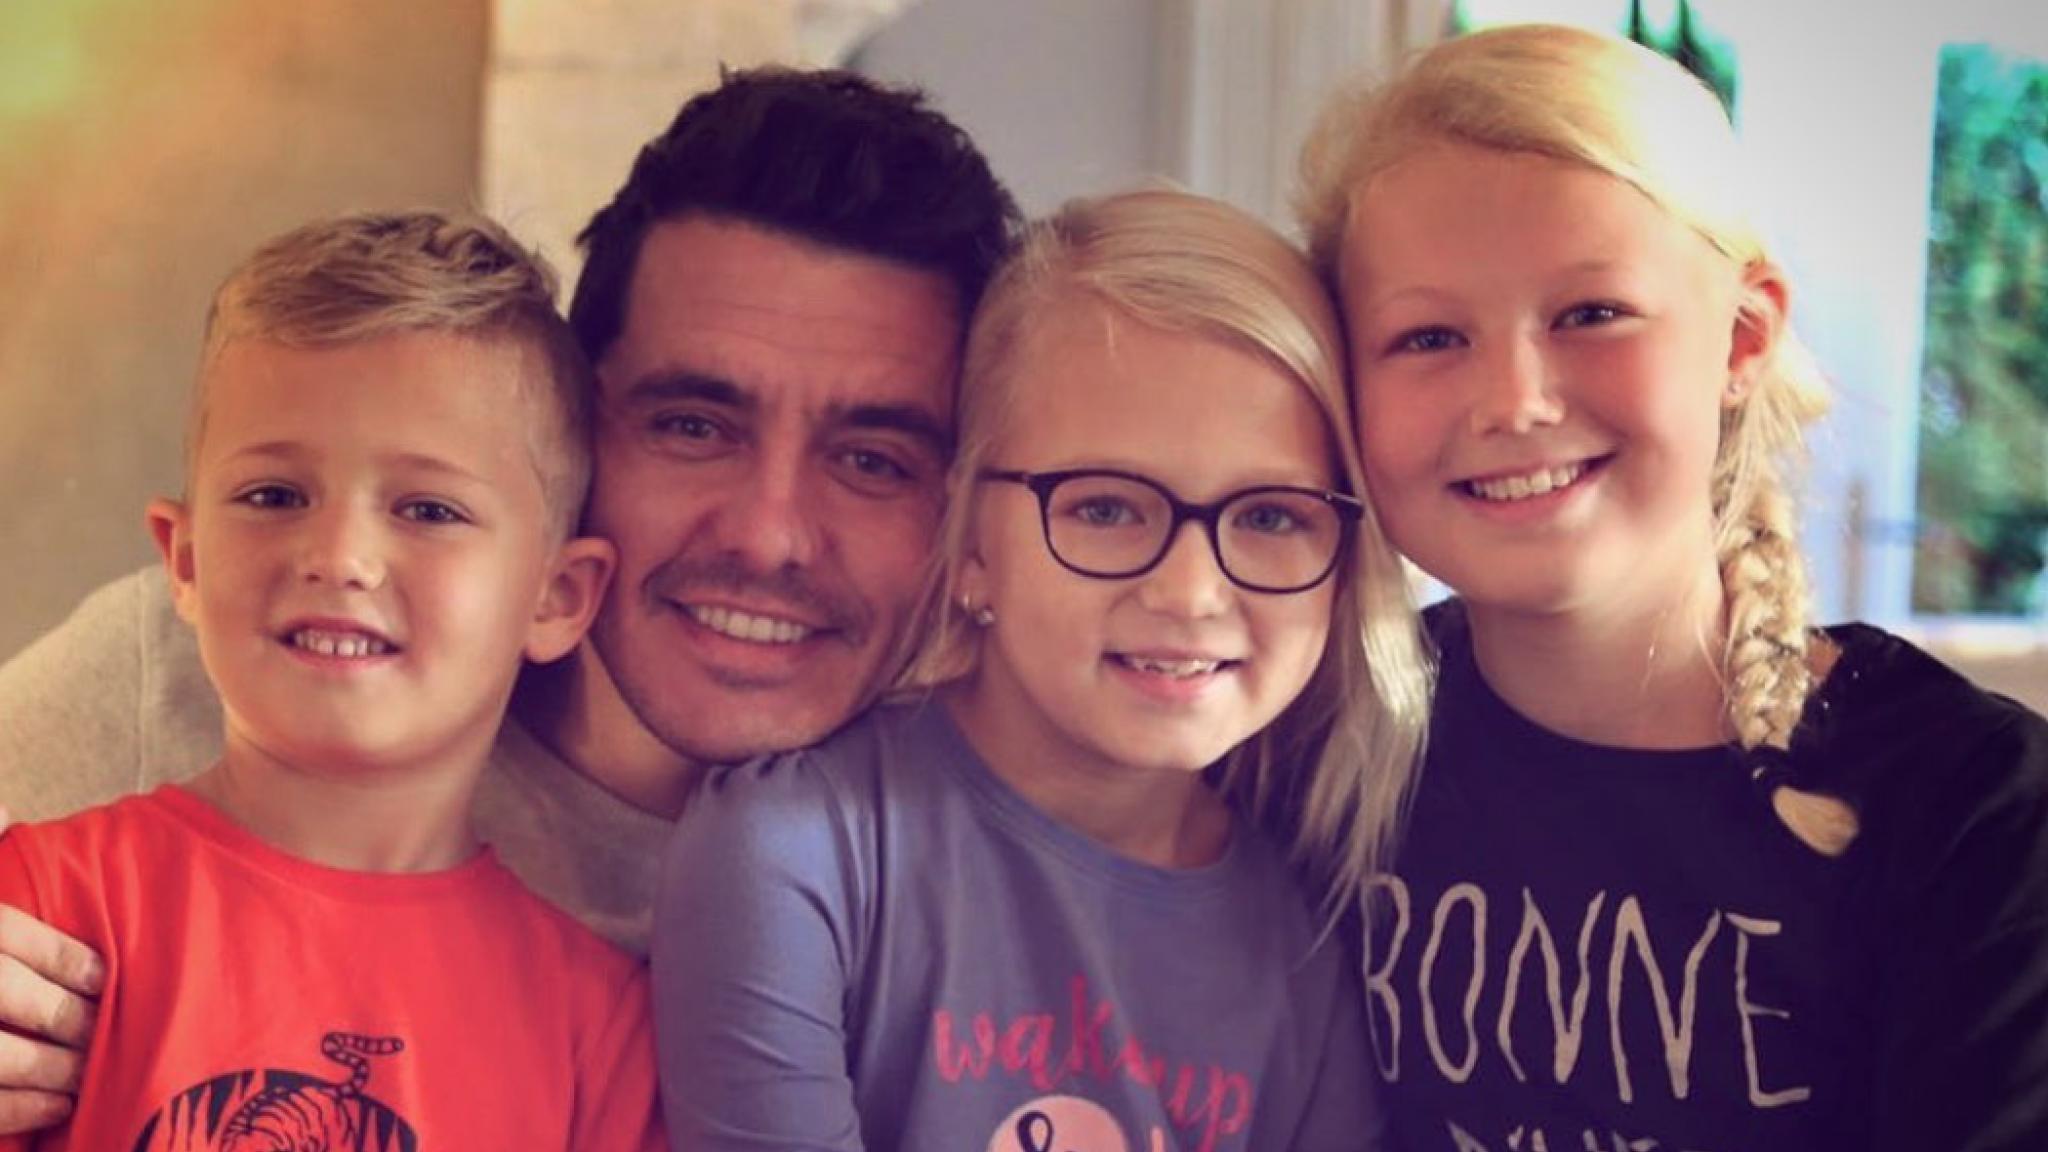 Jan Smit viert negende verjaardag dochtertje Emma - RTL Boulevard